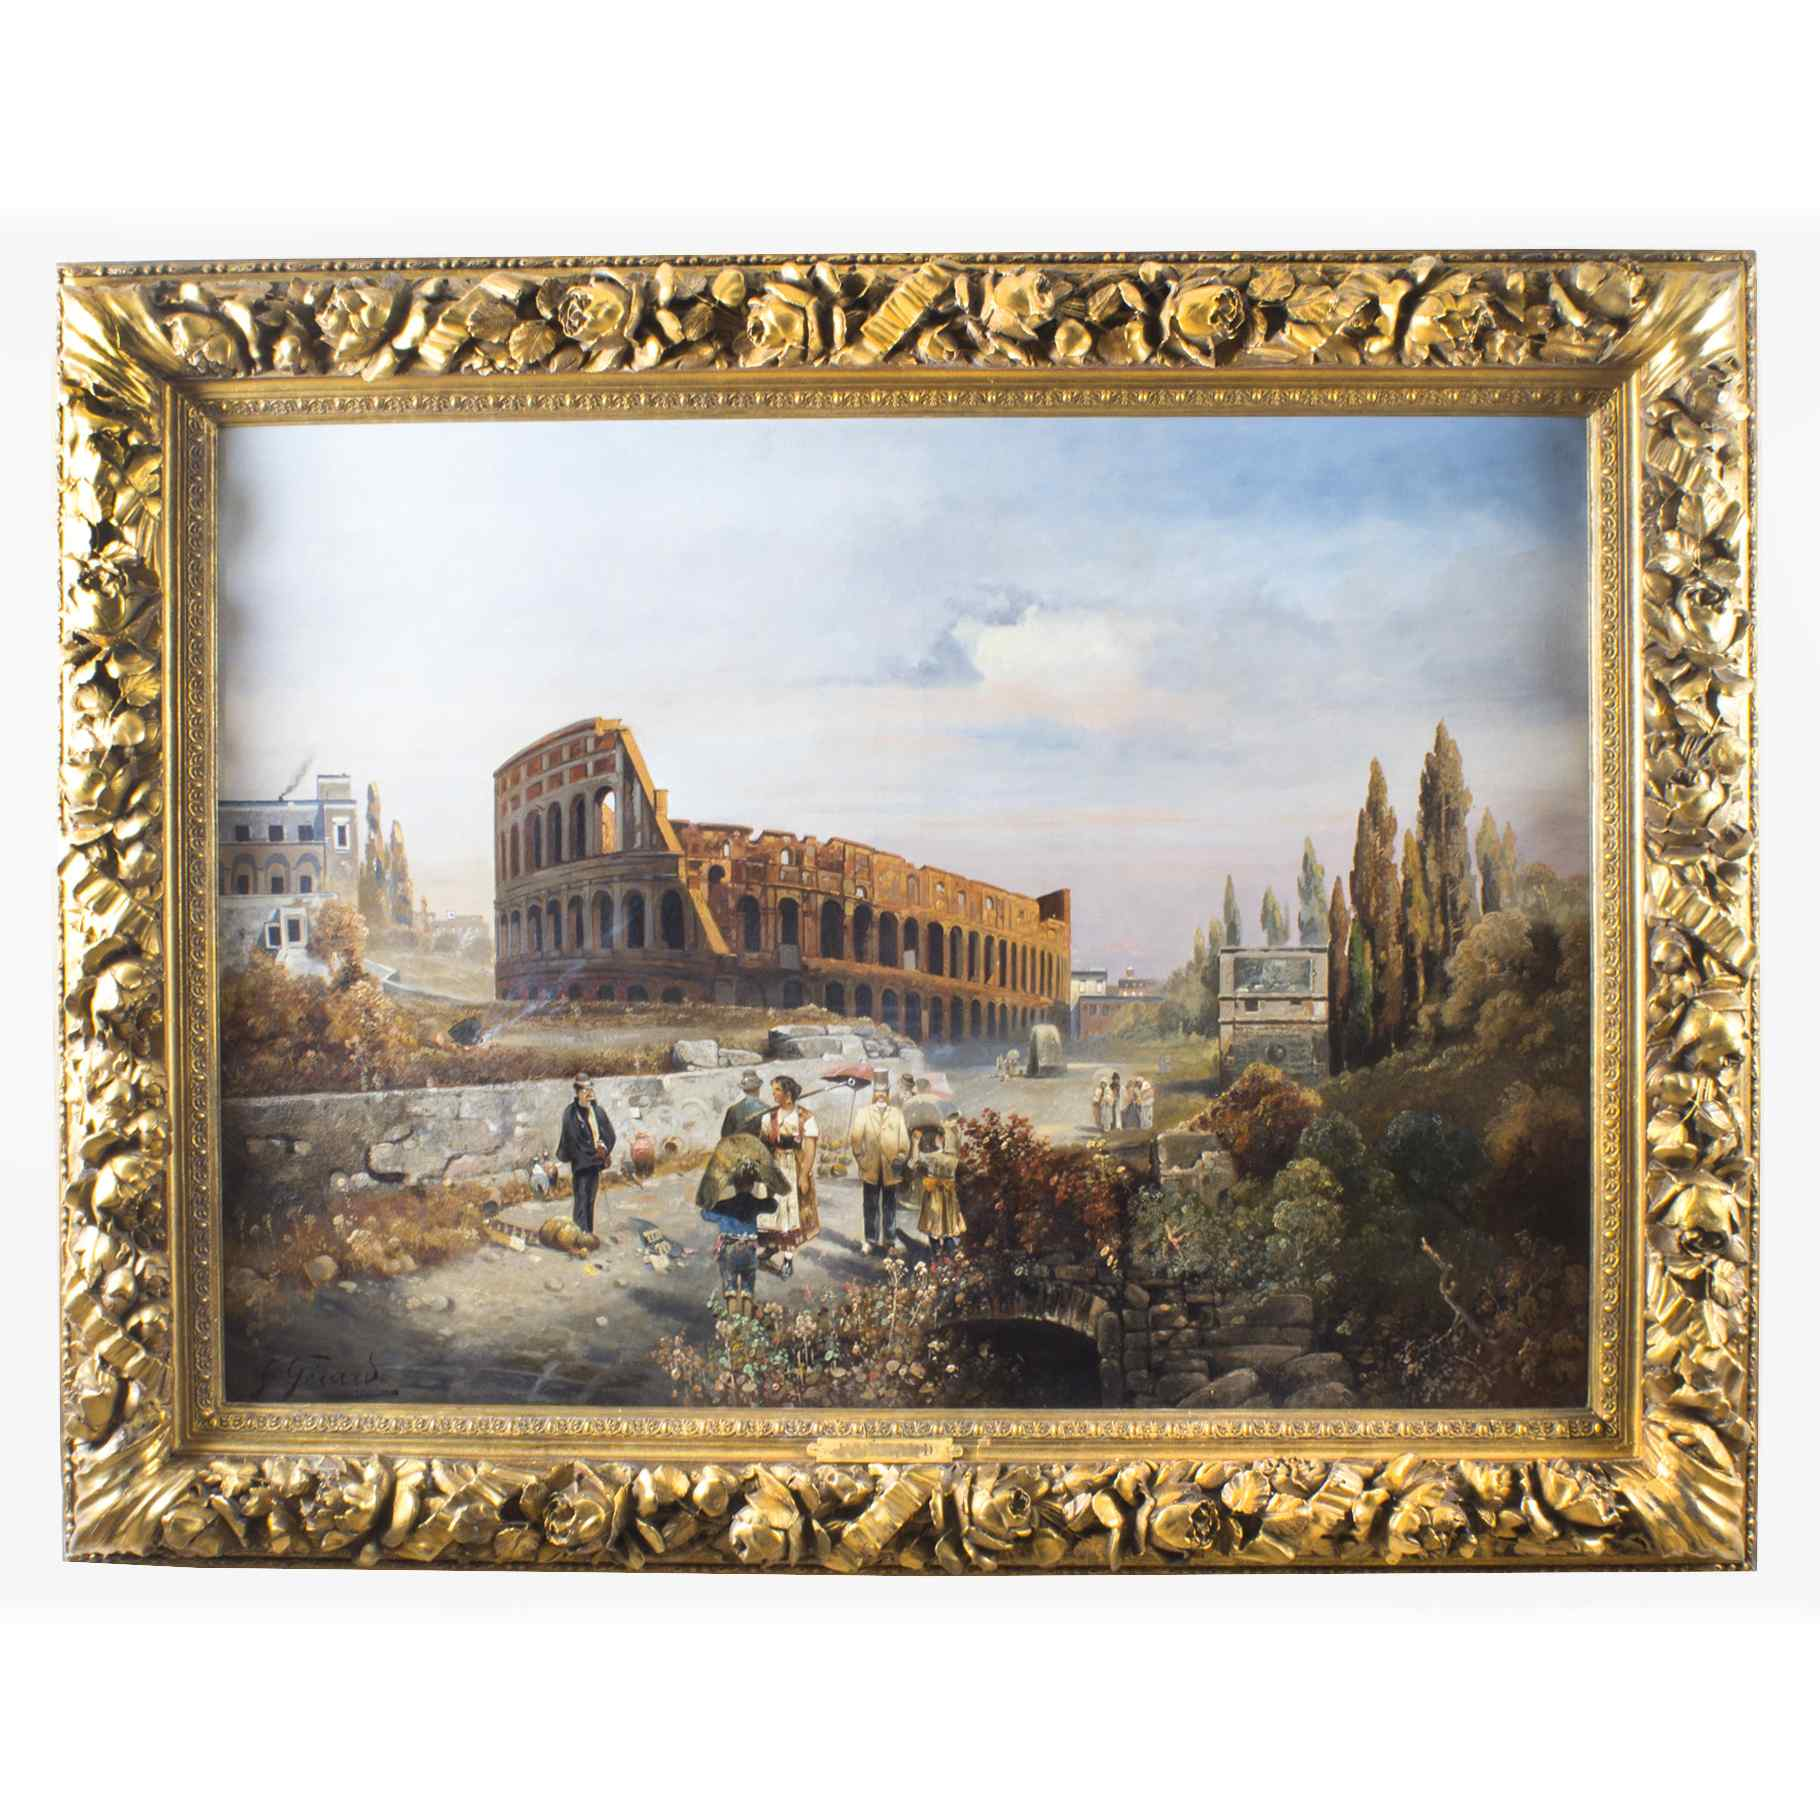 Antico dipinto ad olio François Gérard 1770-1837